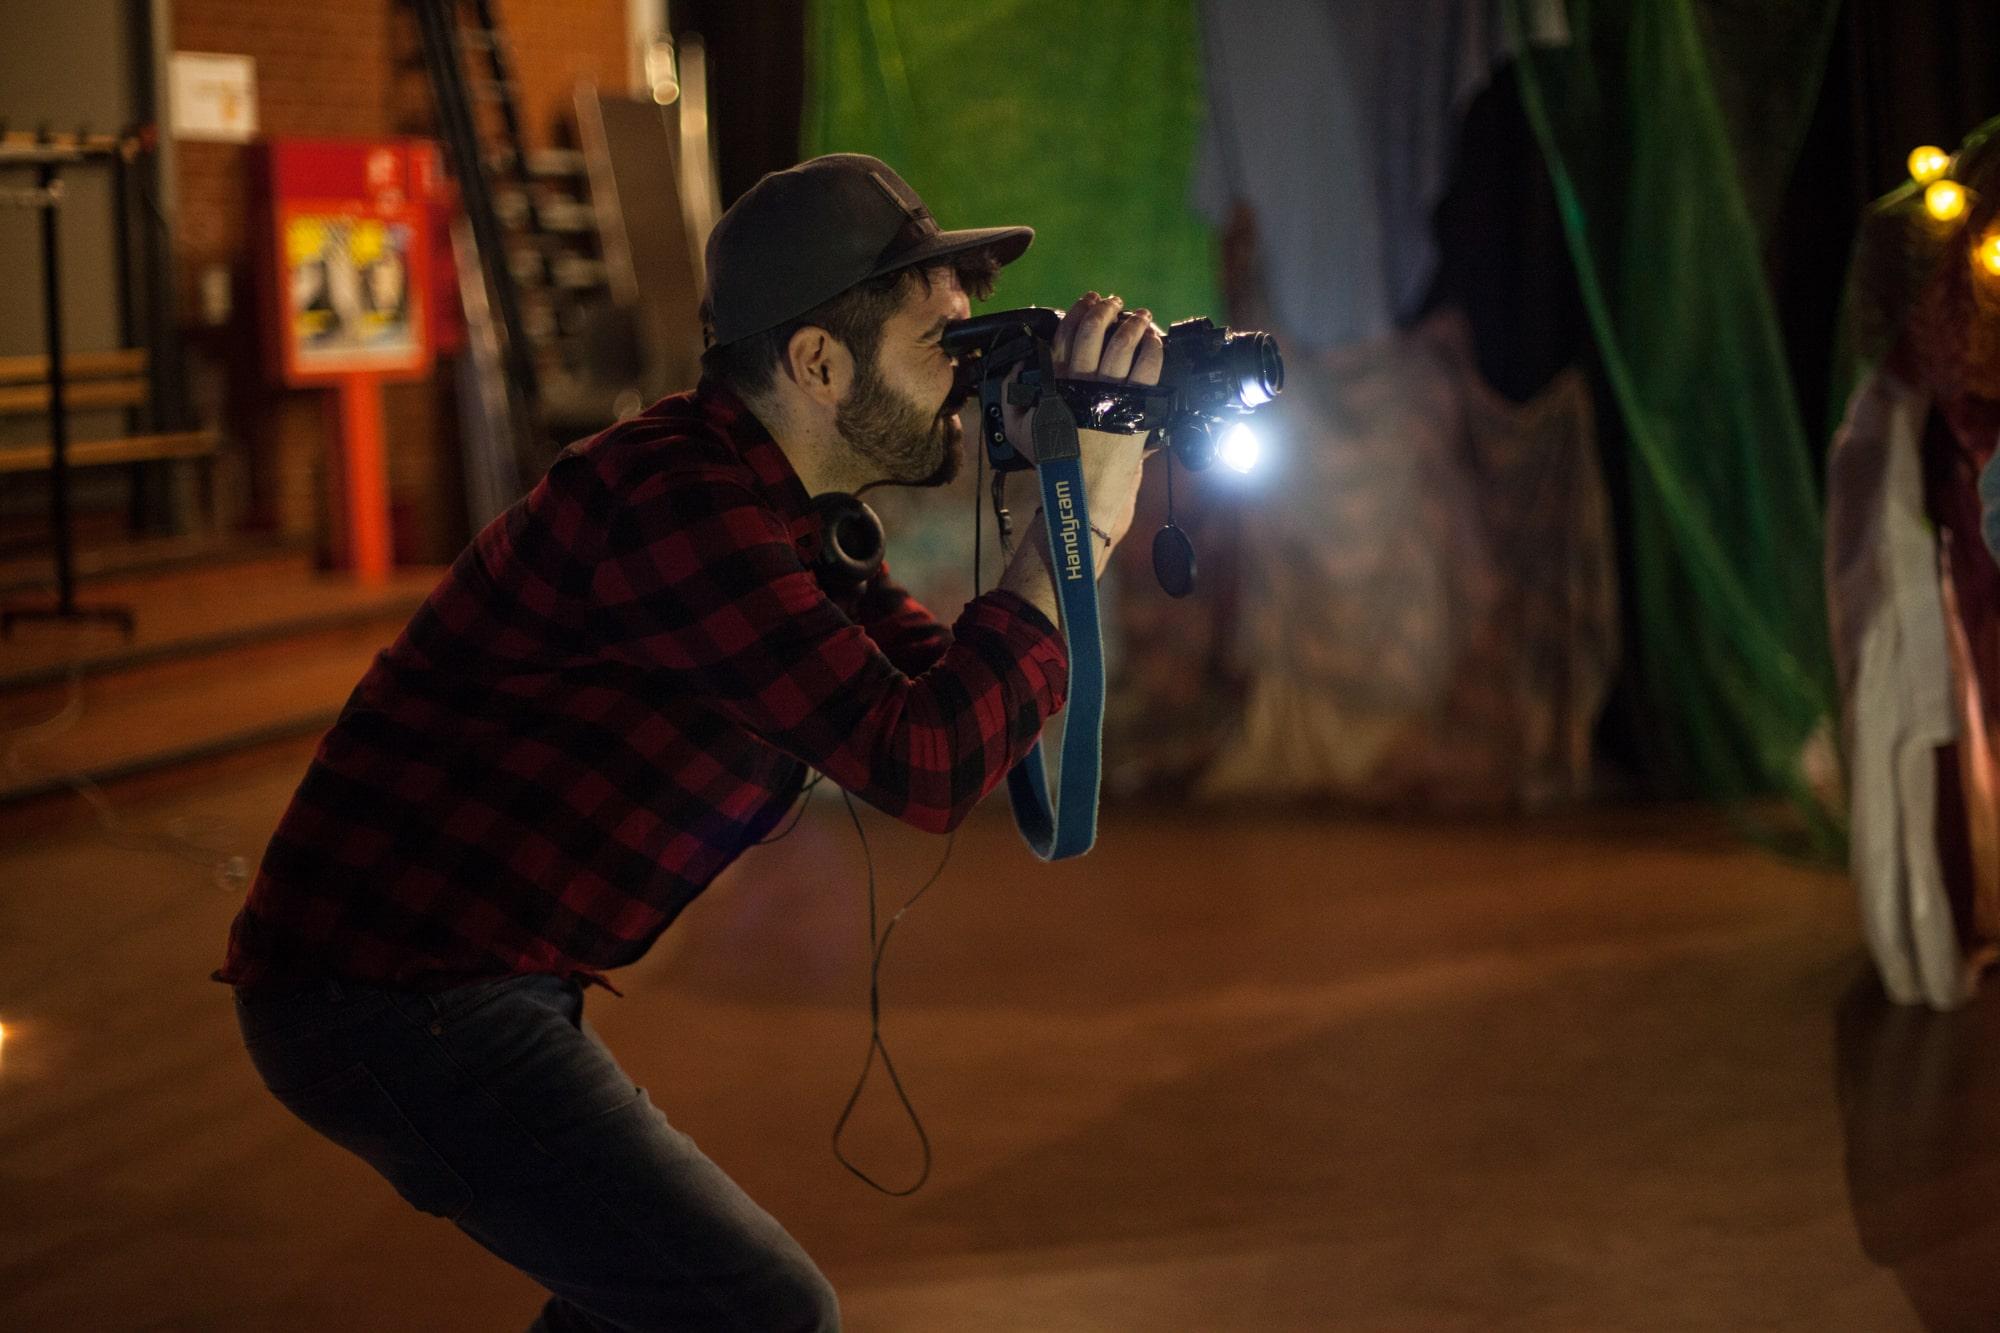 backstage man holding a camera dark hair grey baseball cap